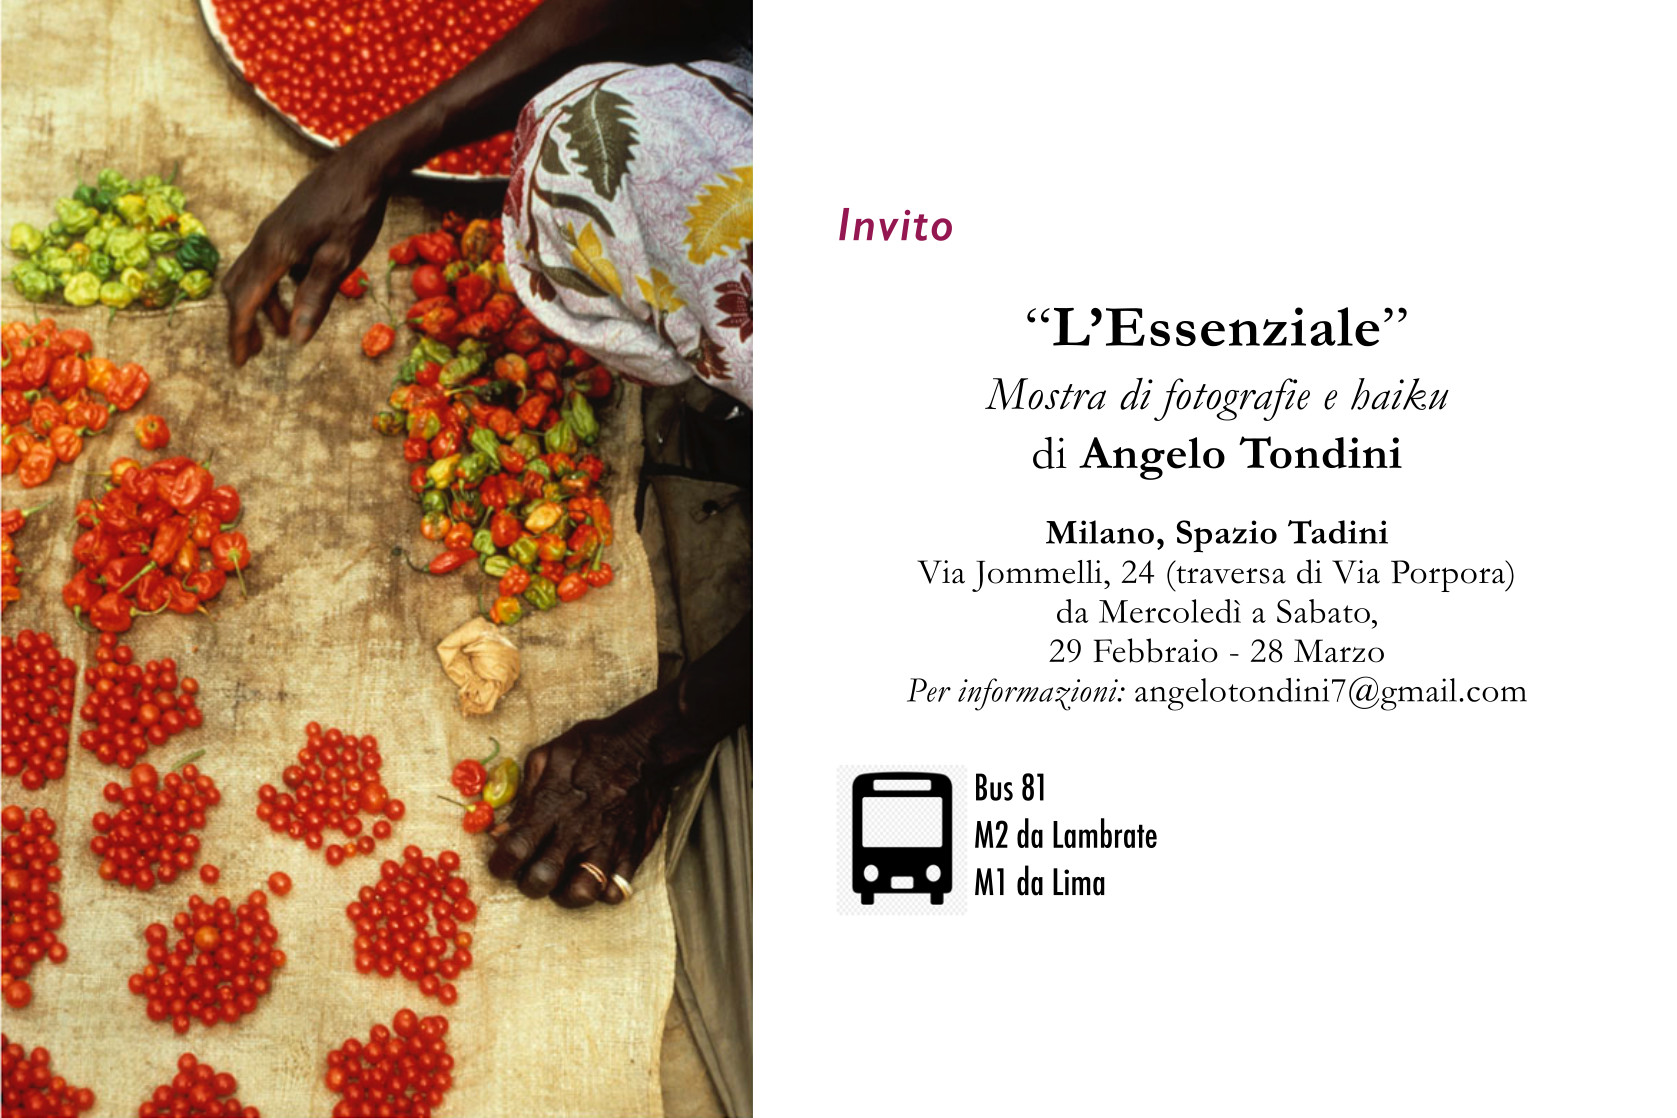 Fotografia e haiku di Angelo Tondini – l'essenziale